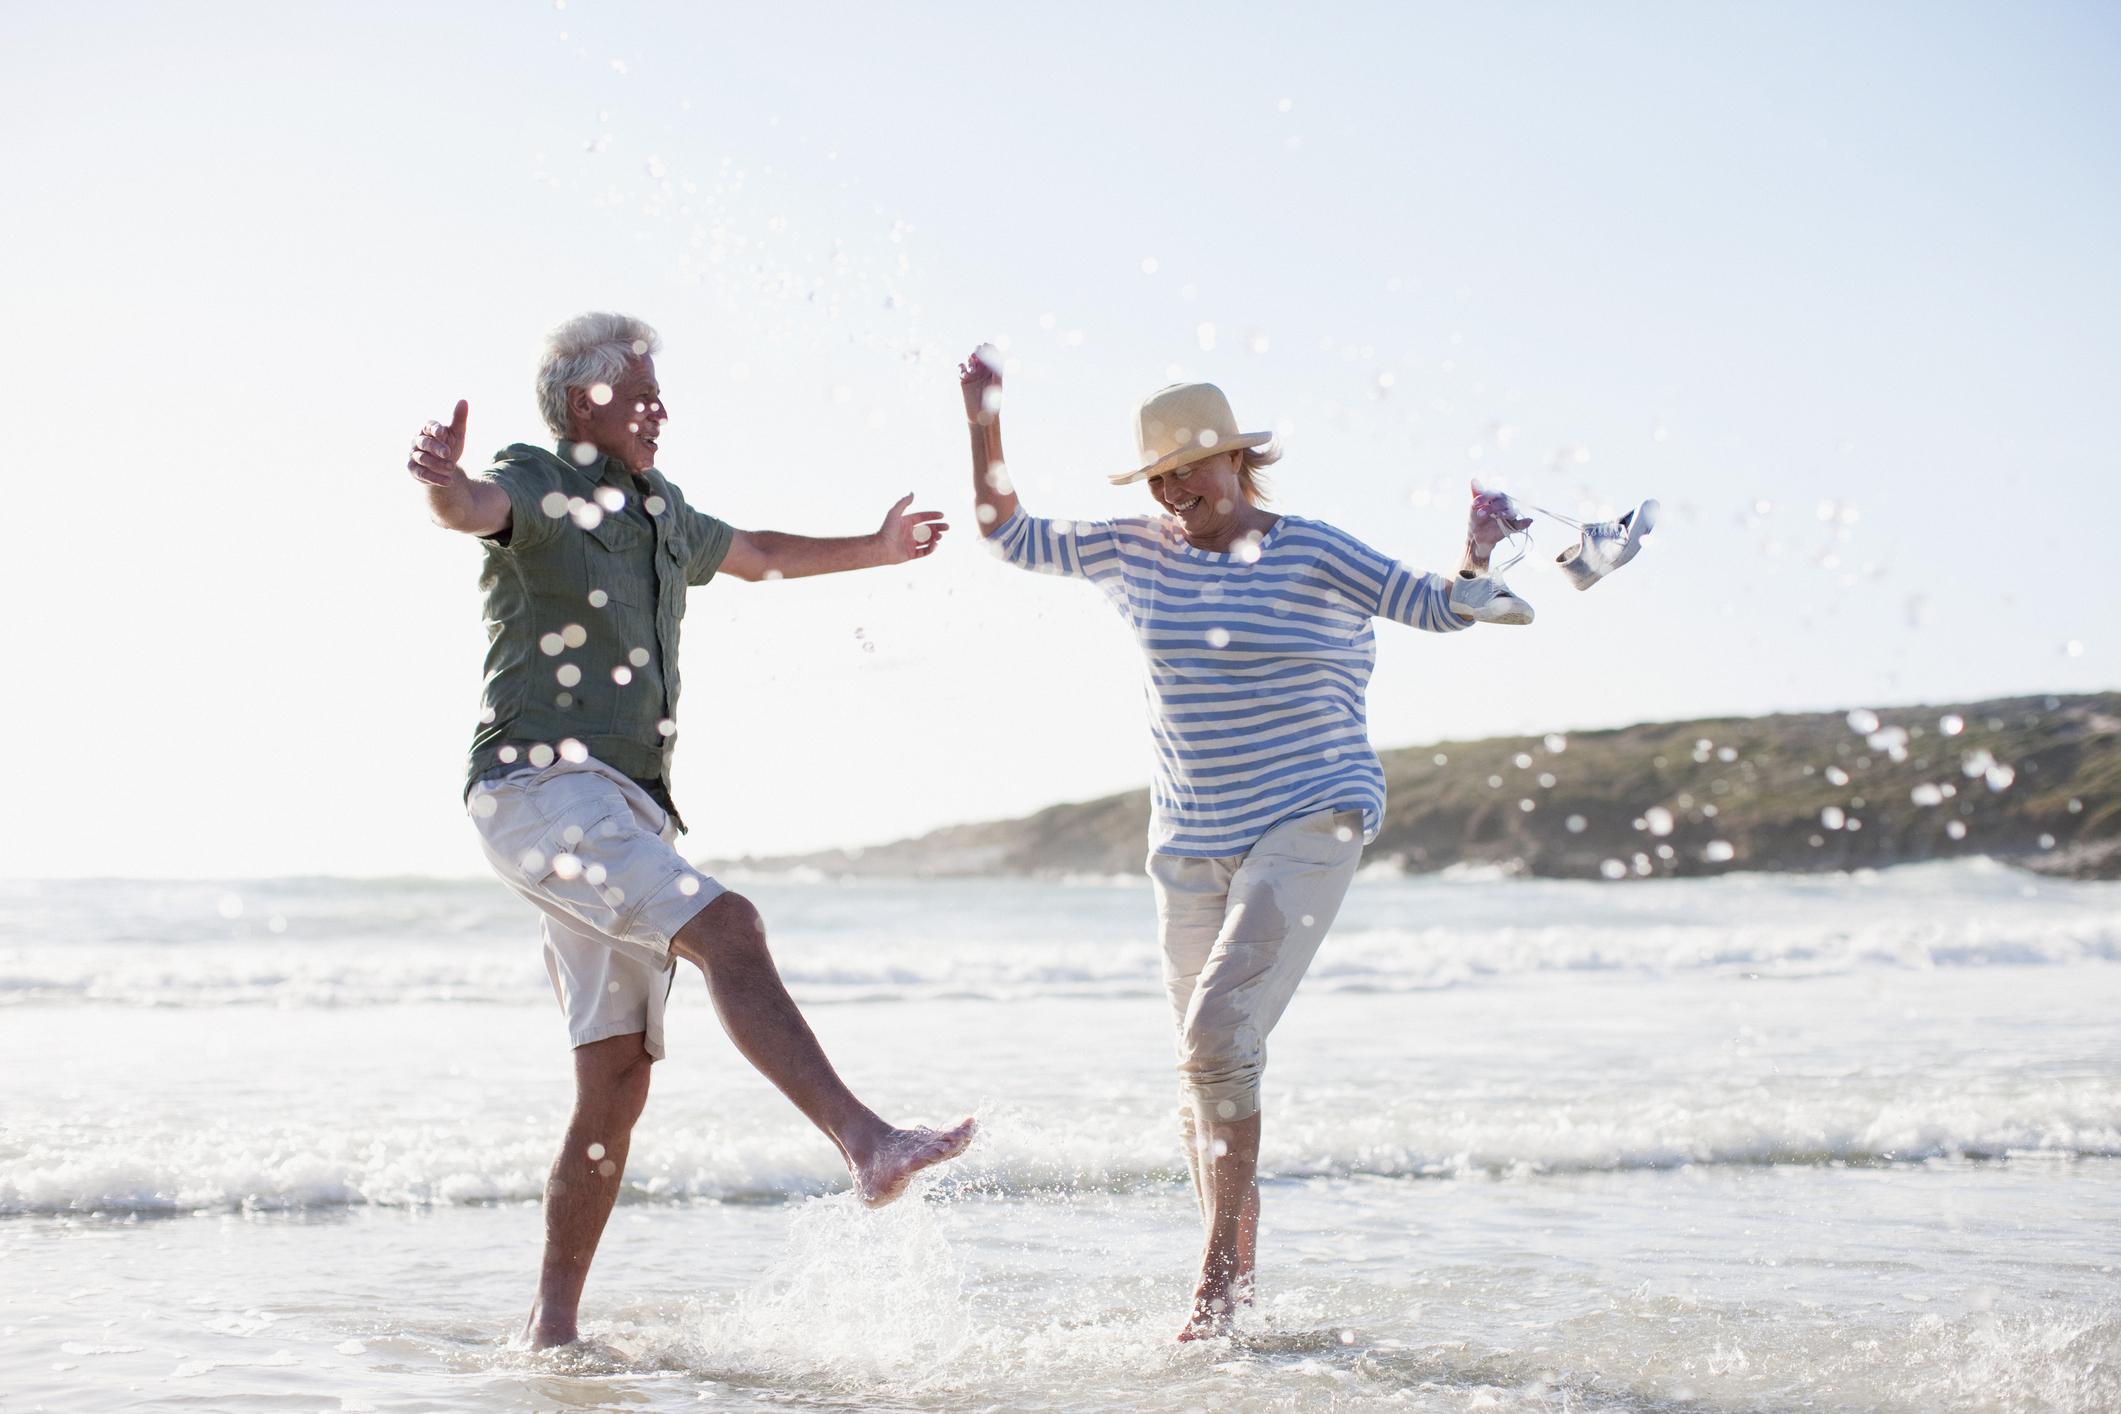 Two older folks splashing in the ocean